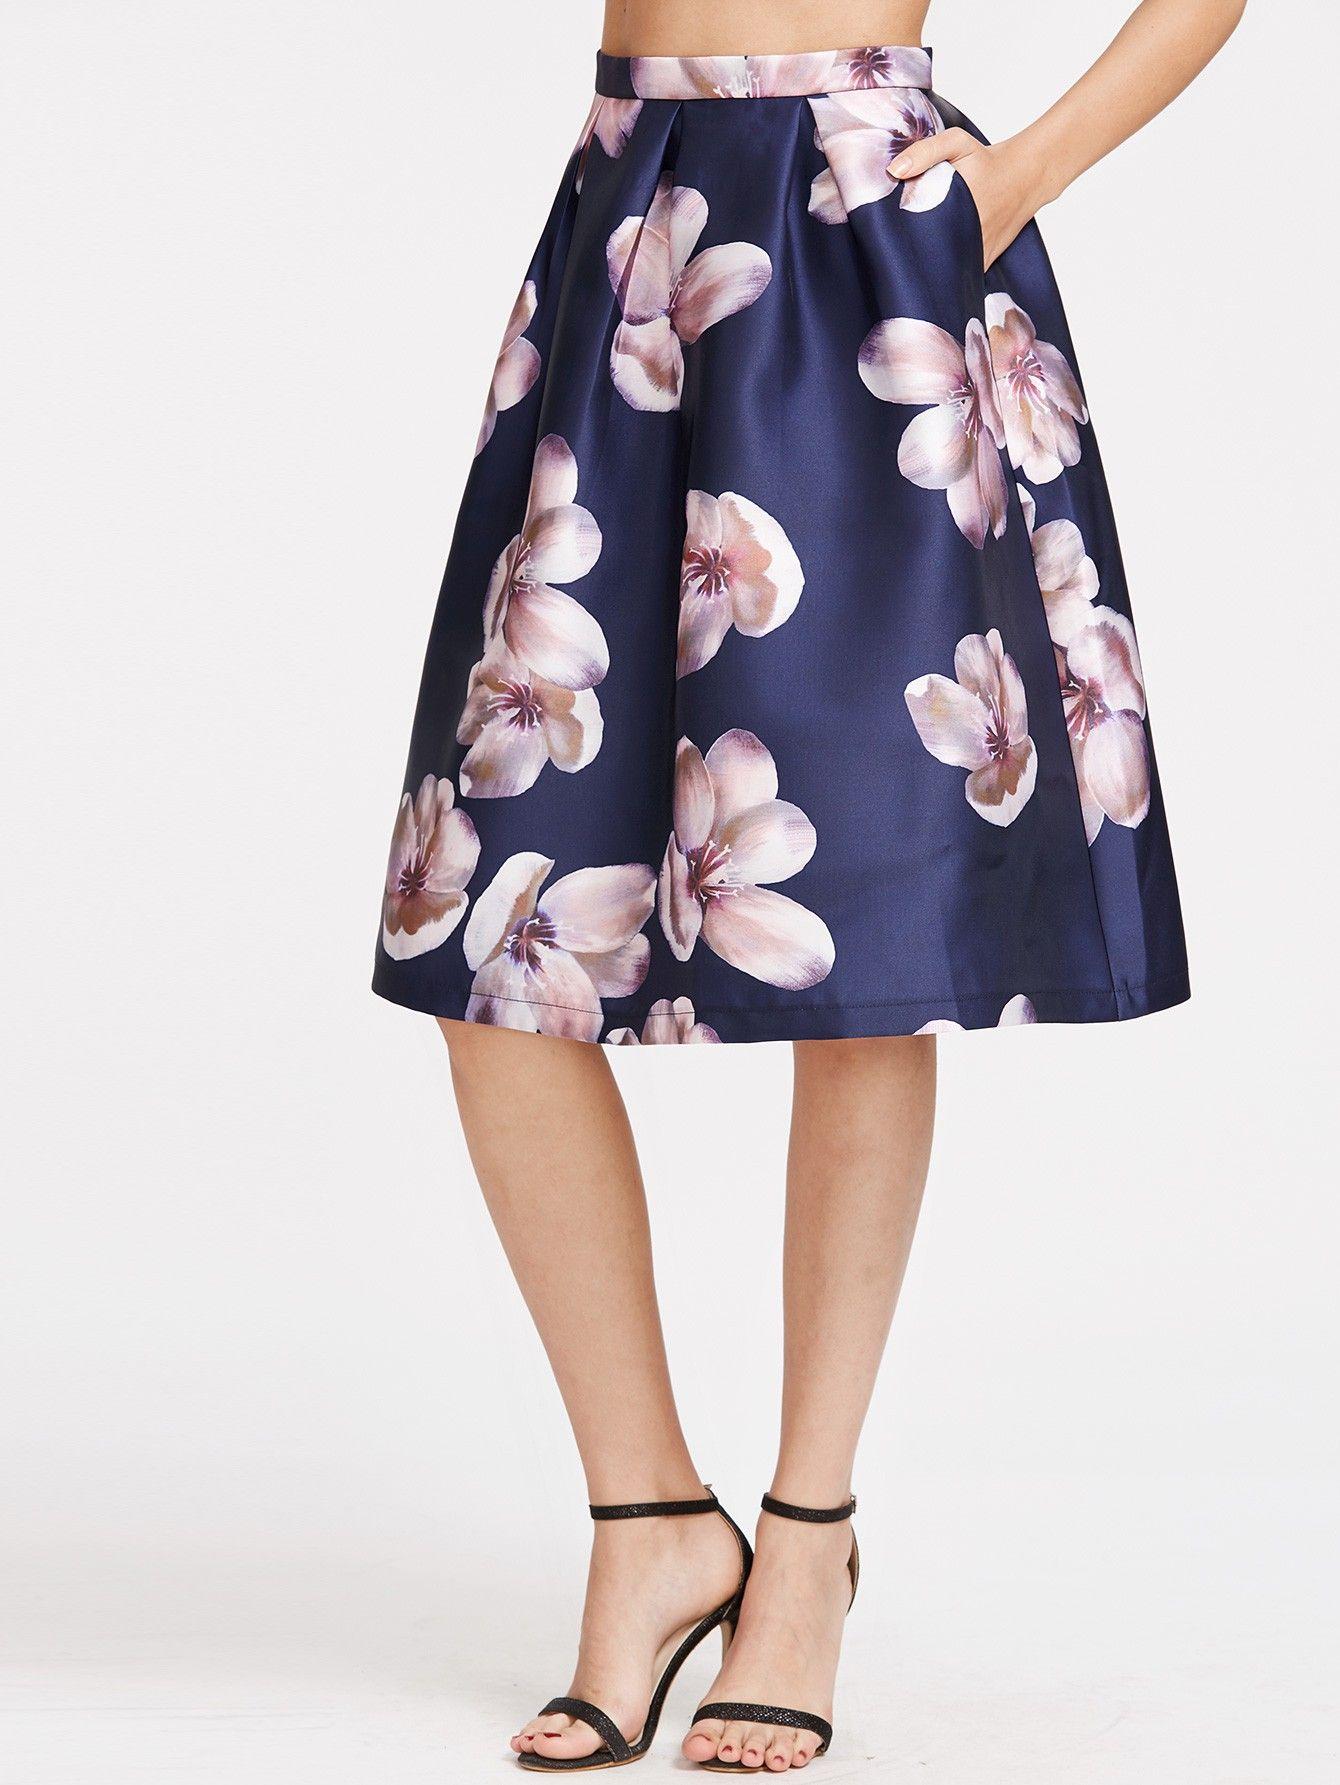 Navy Flower Print Box Pleated Volume Skirt Box Pleat Skirt Floral Print Midi Skirt Skirt Fashion